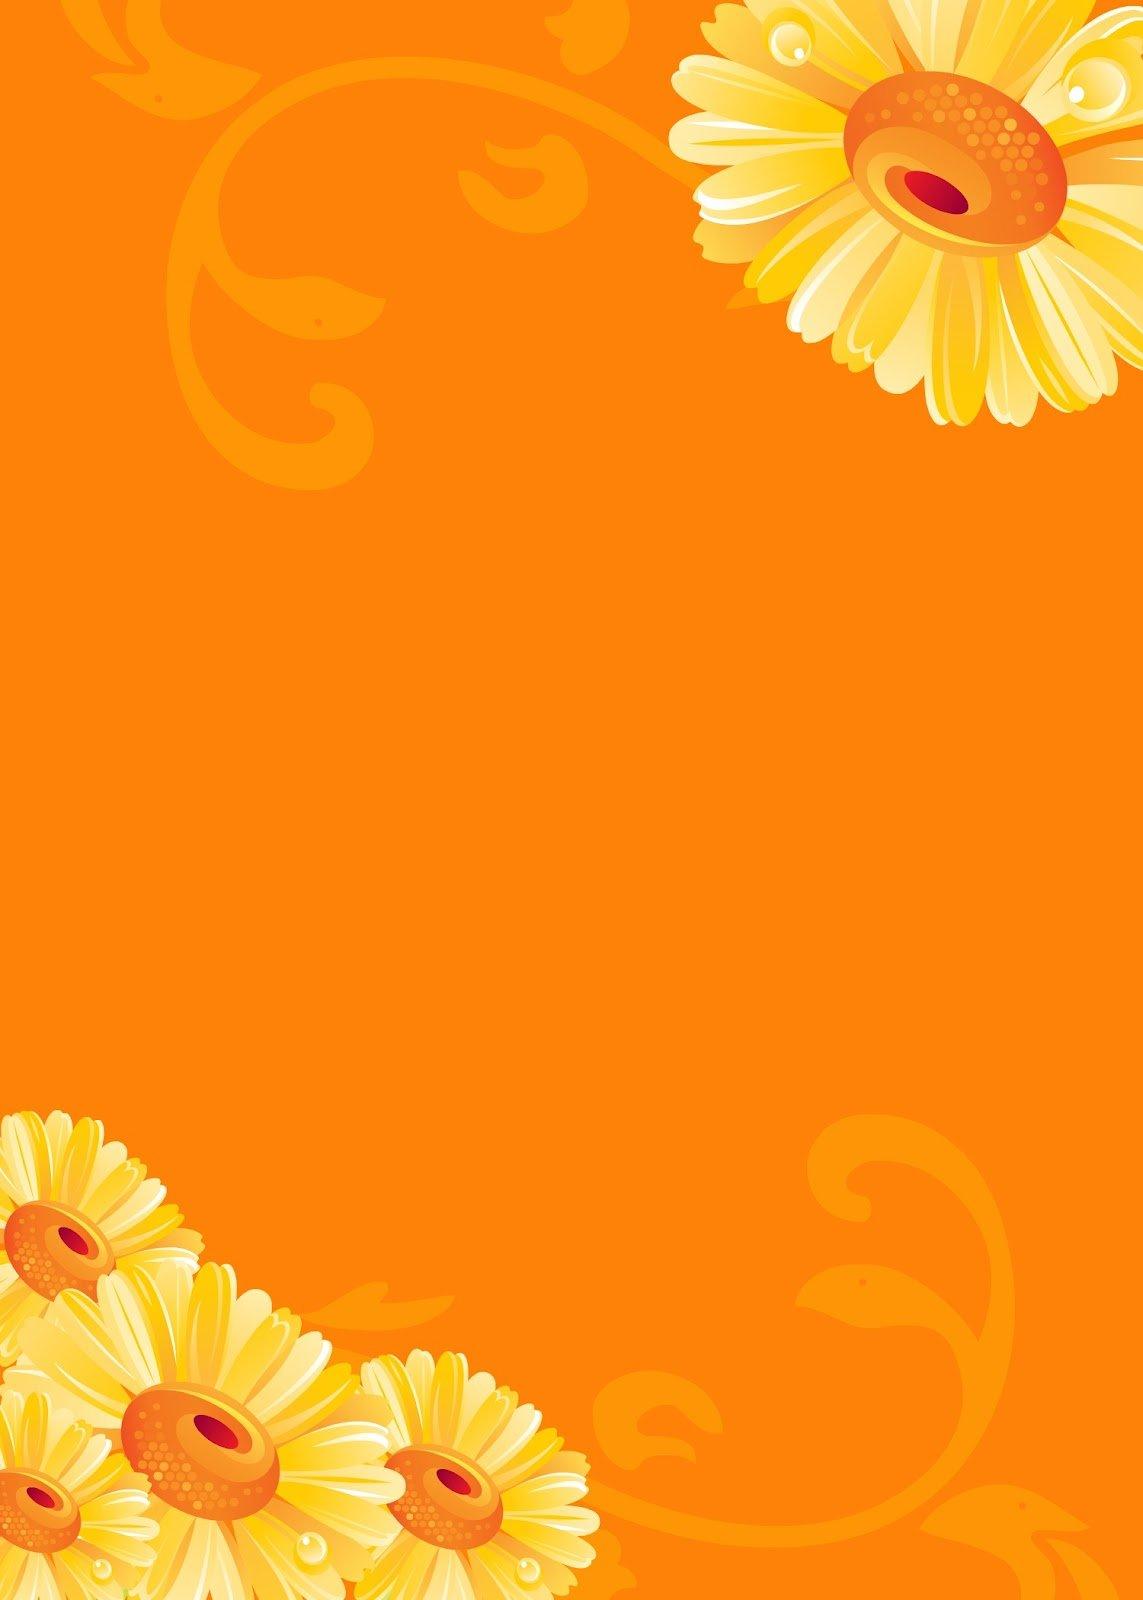 Blank Invitation Card Design